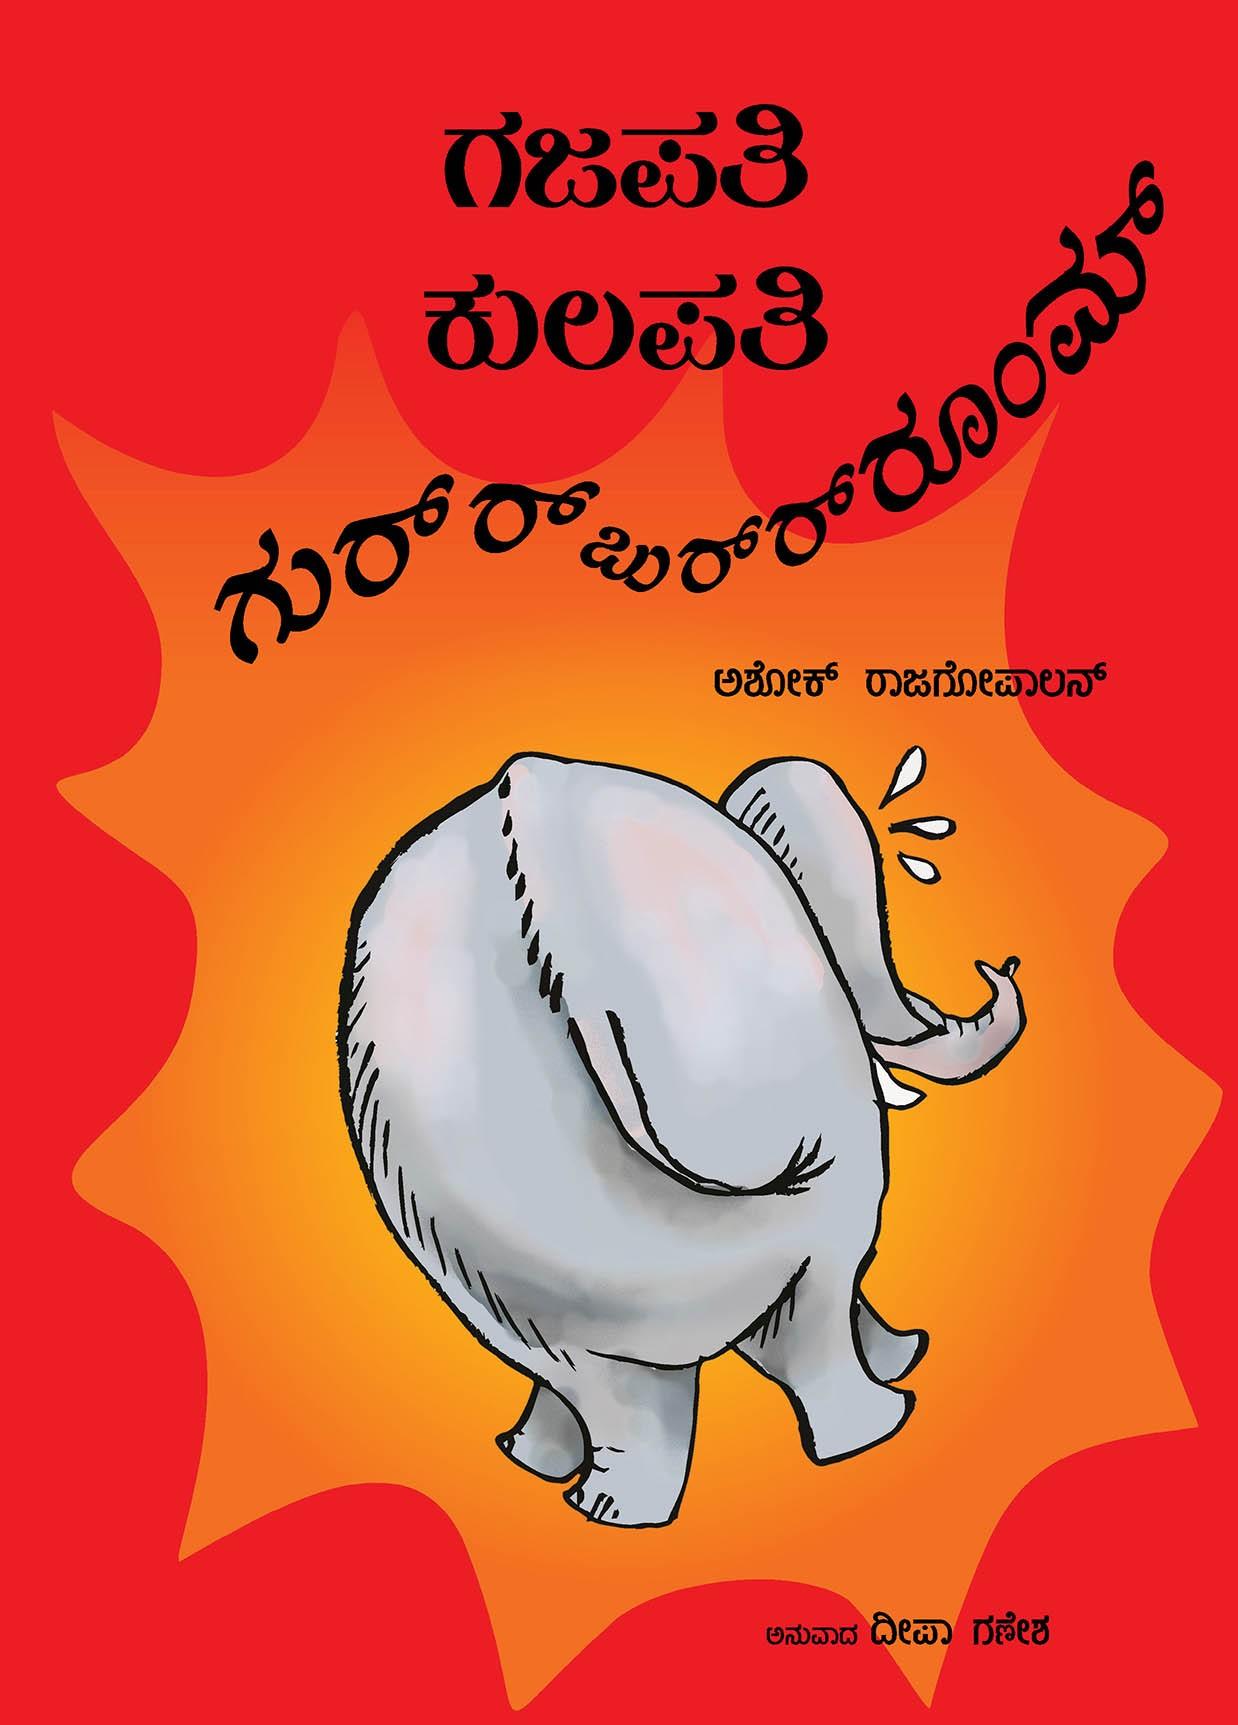 Gajapati Kulapati Gurrburrrrooom! (Kannada)